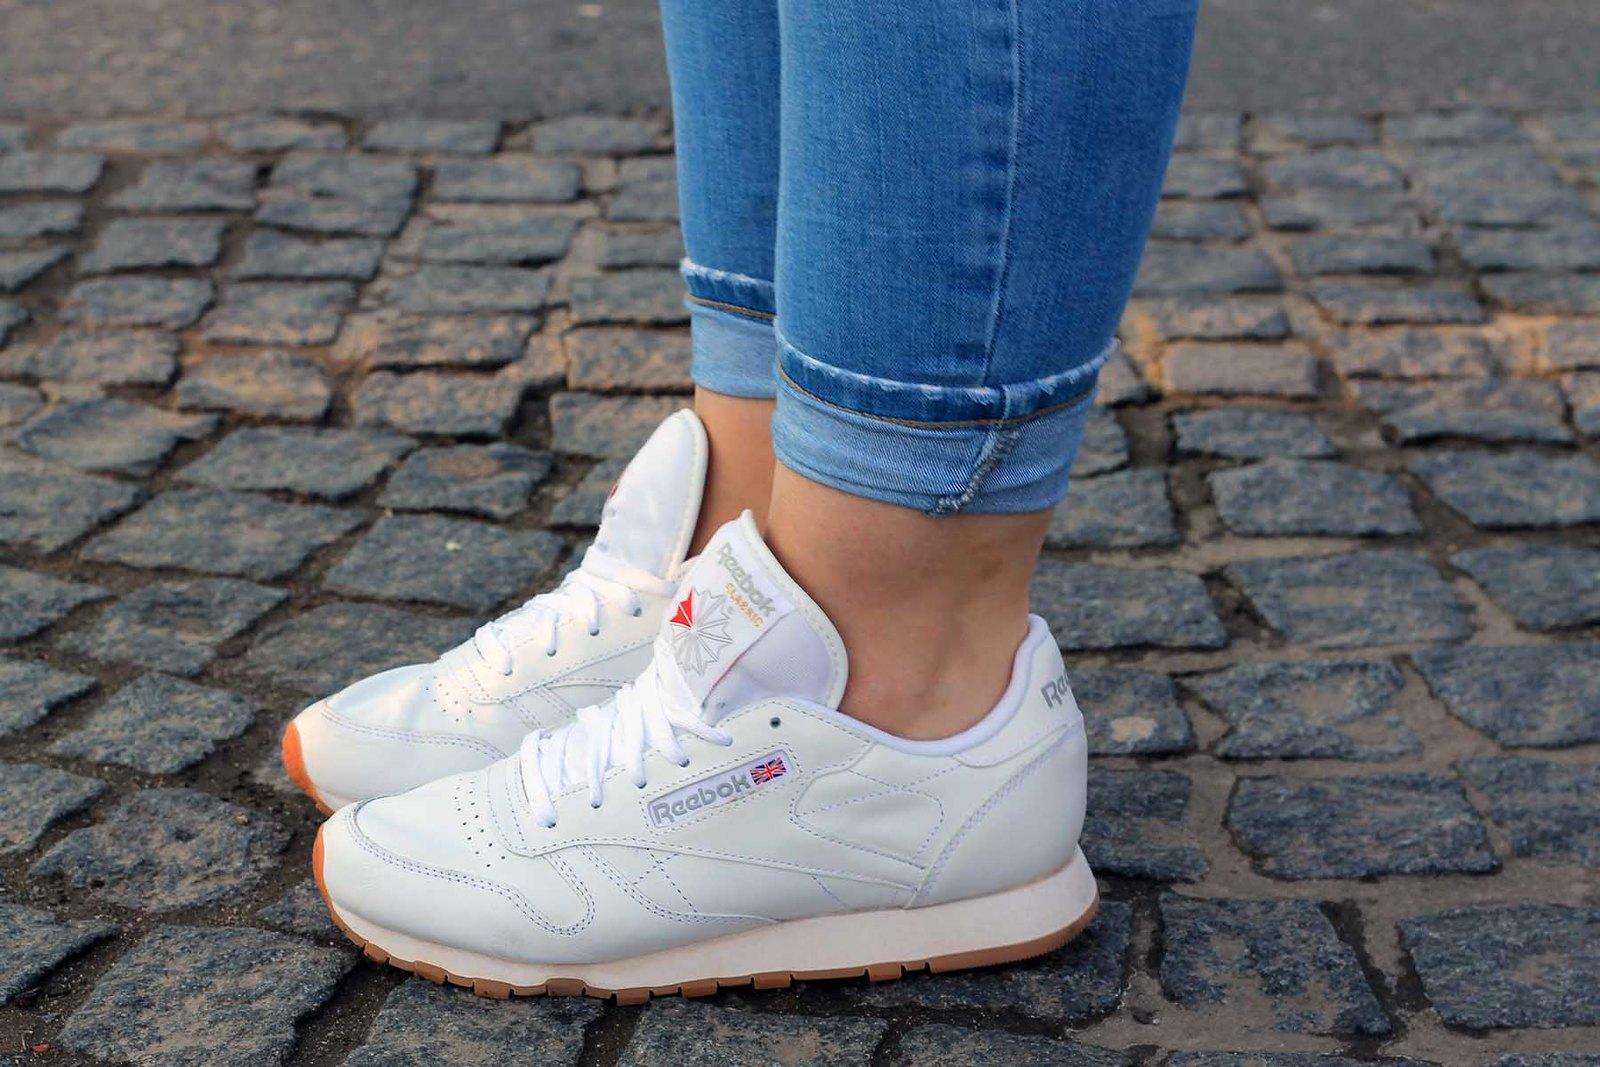 reebok-sneaker-weiß-classic-schuhe-modeblog-outfit